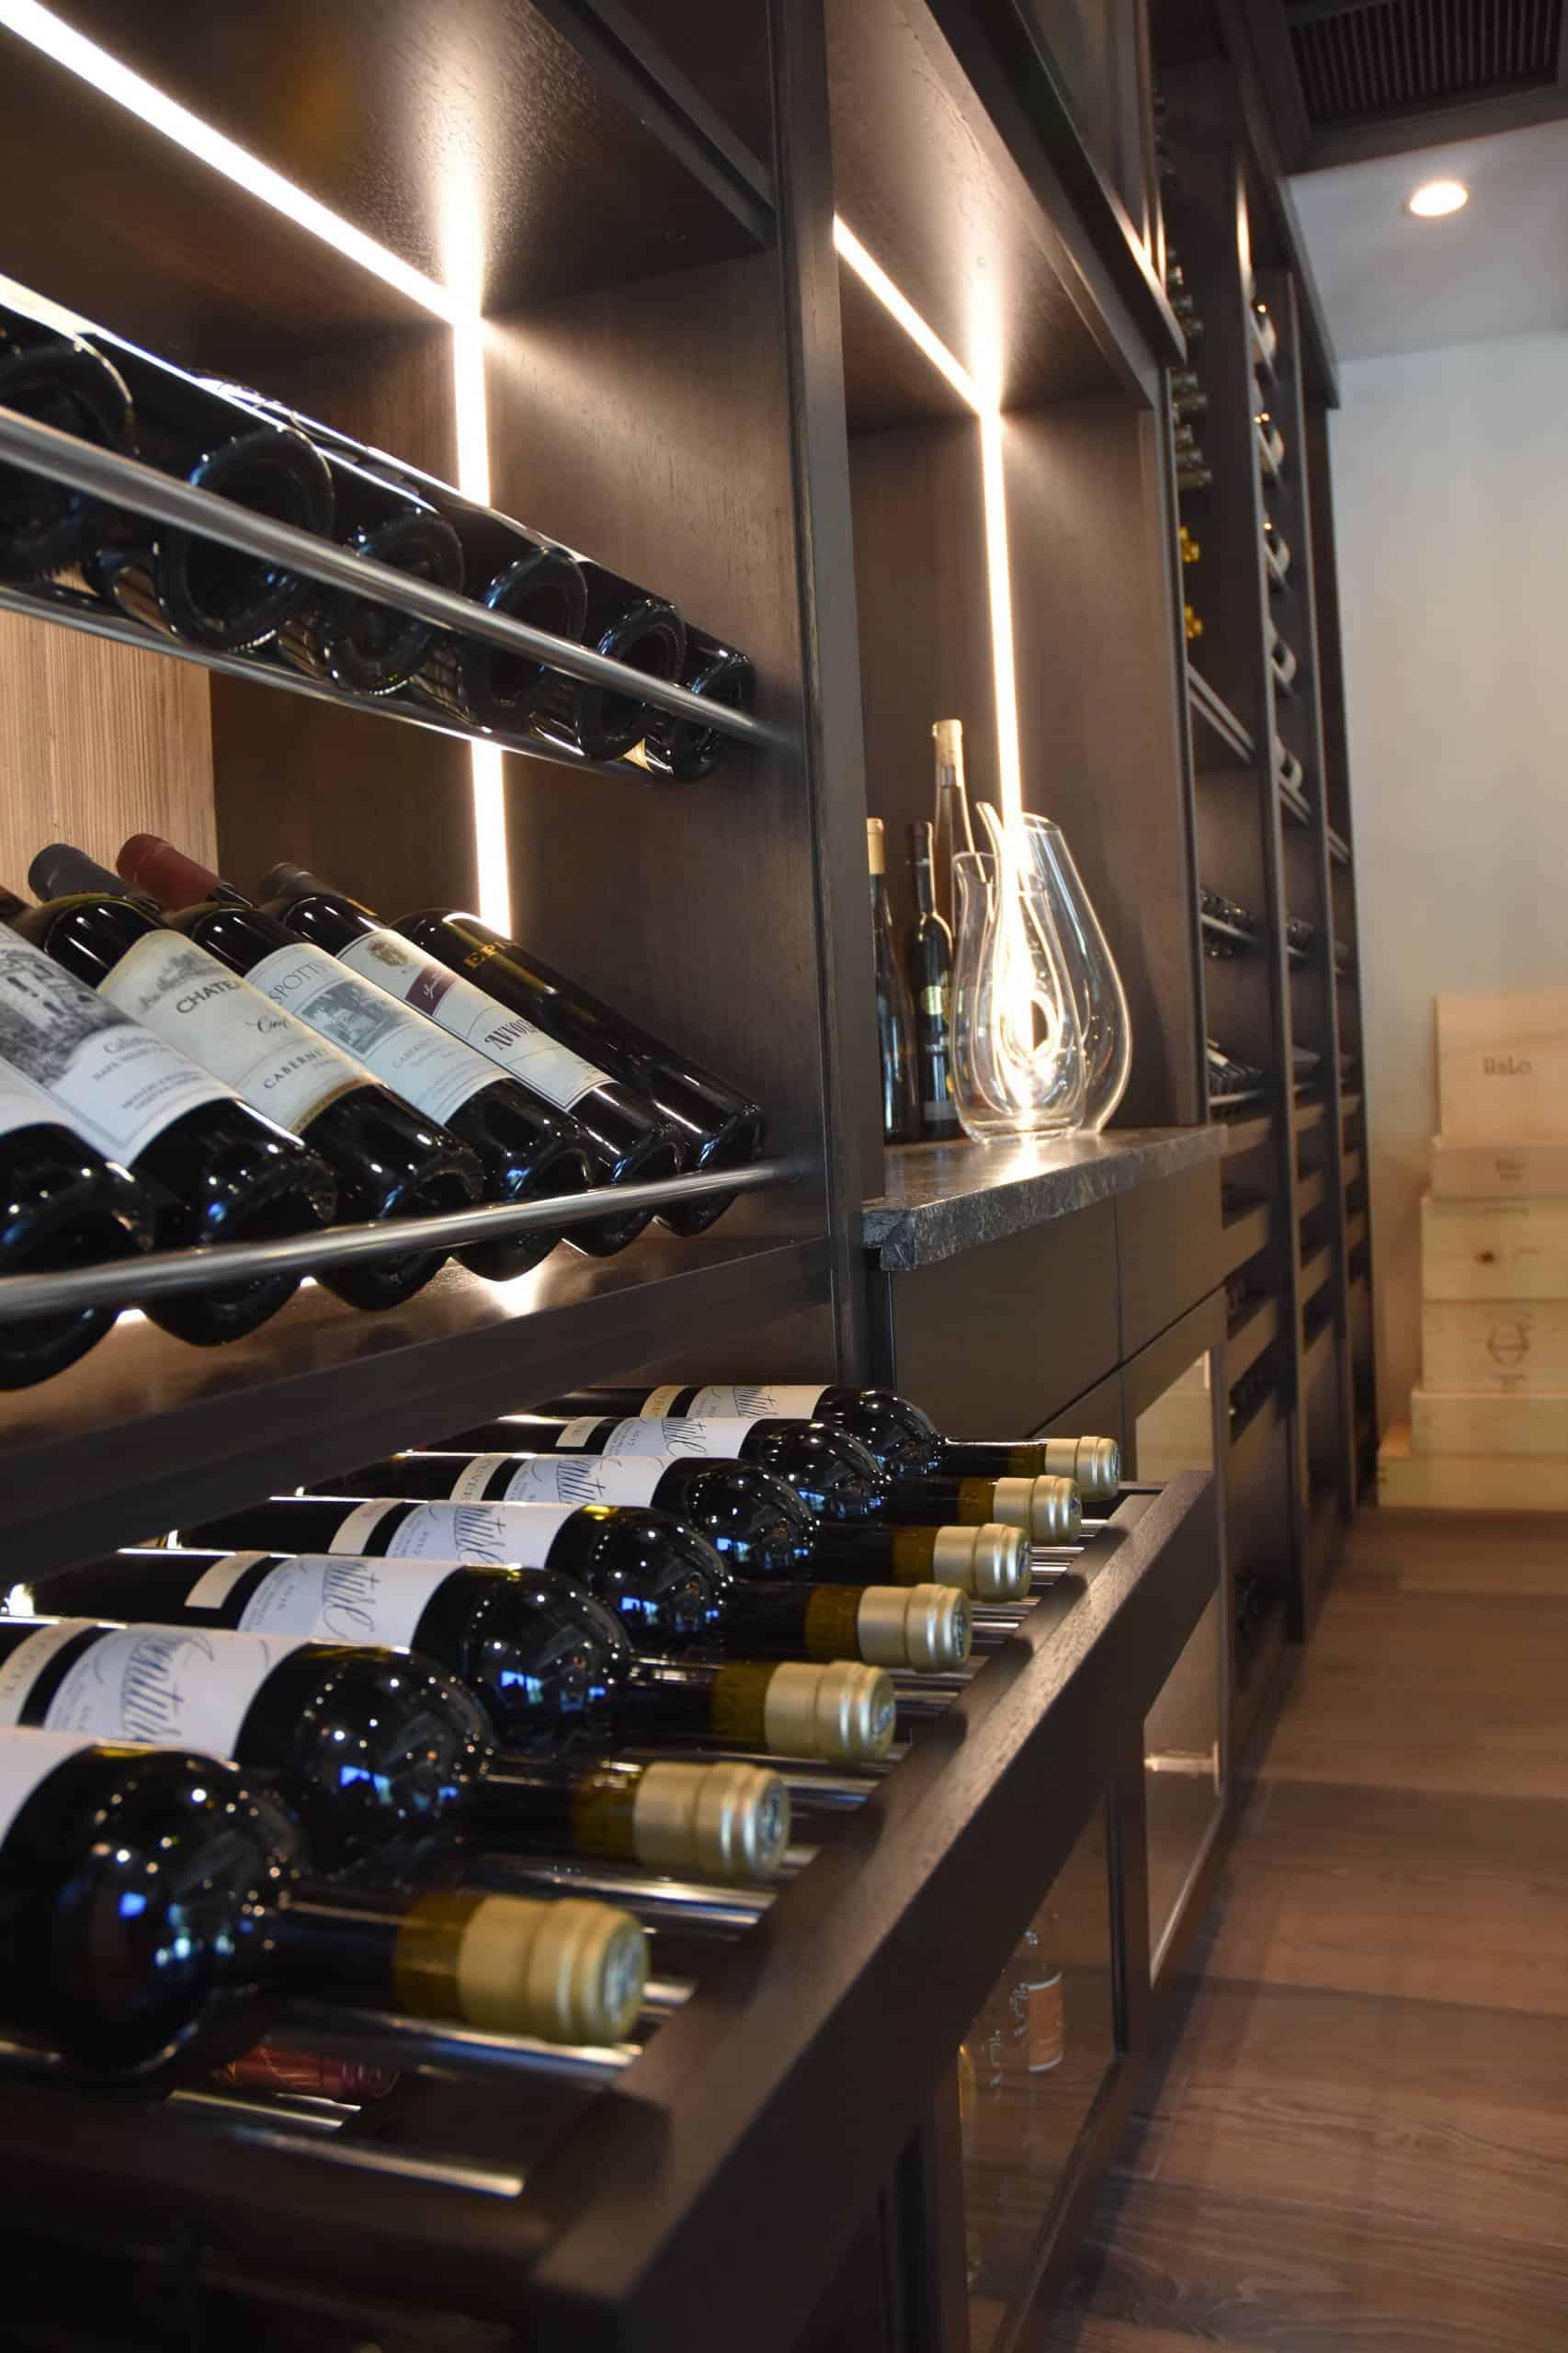 san juan capistrano glass contemporary modern wine cellar wine wall wine room vintage cellars img dd5121f50d0bd5ef 14 1110 1 7e7d54d